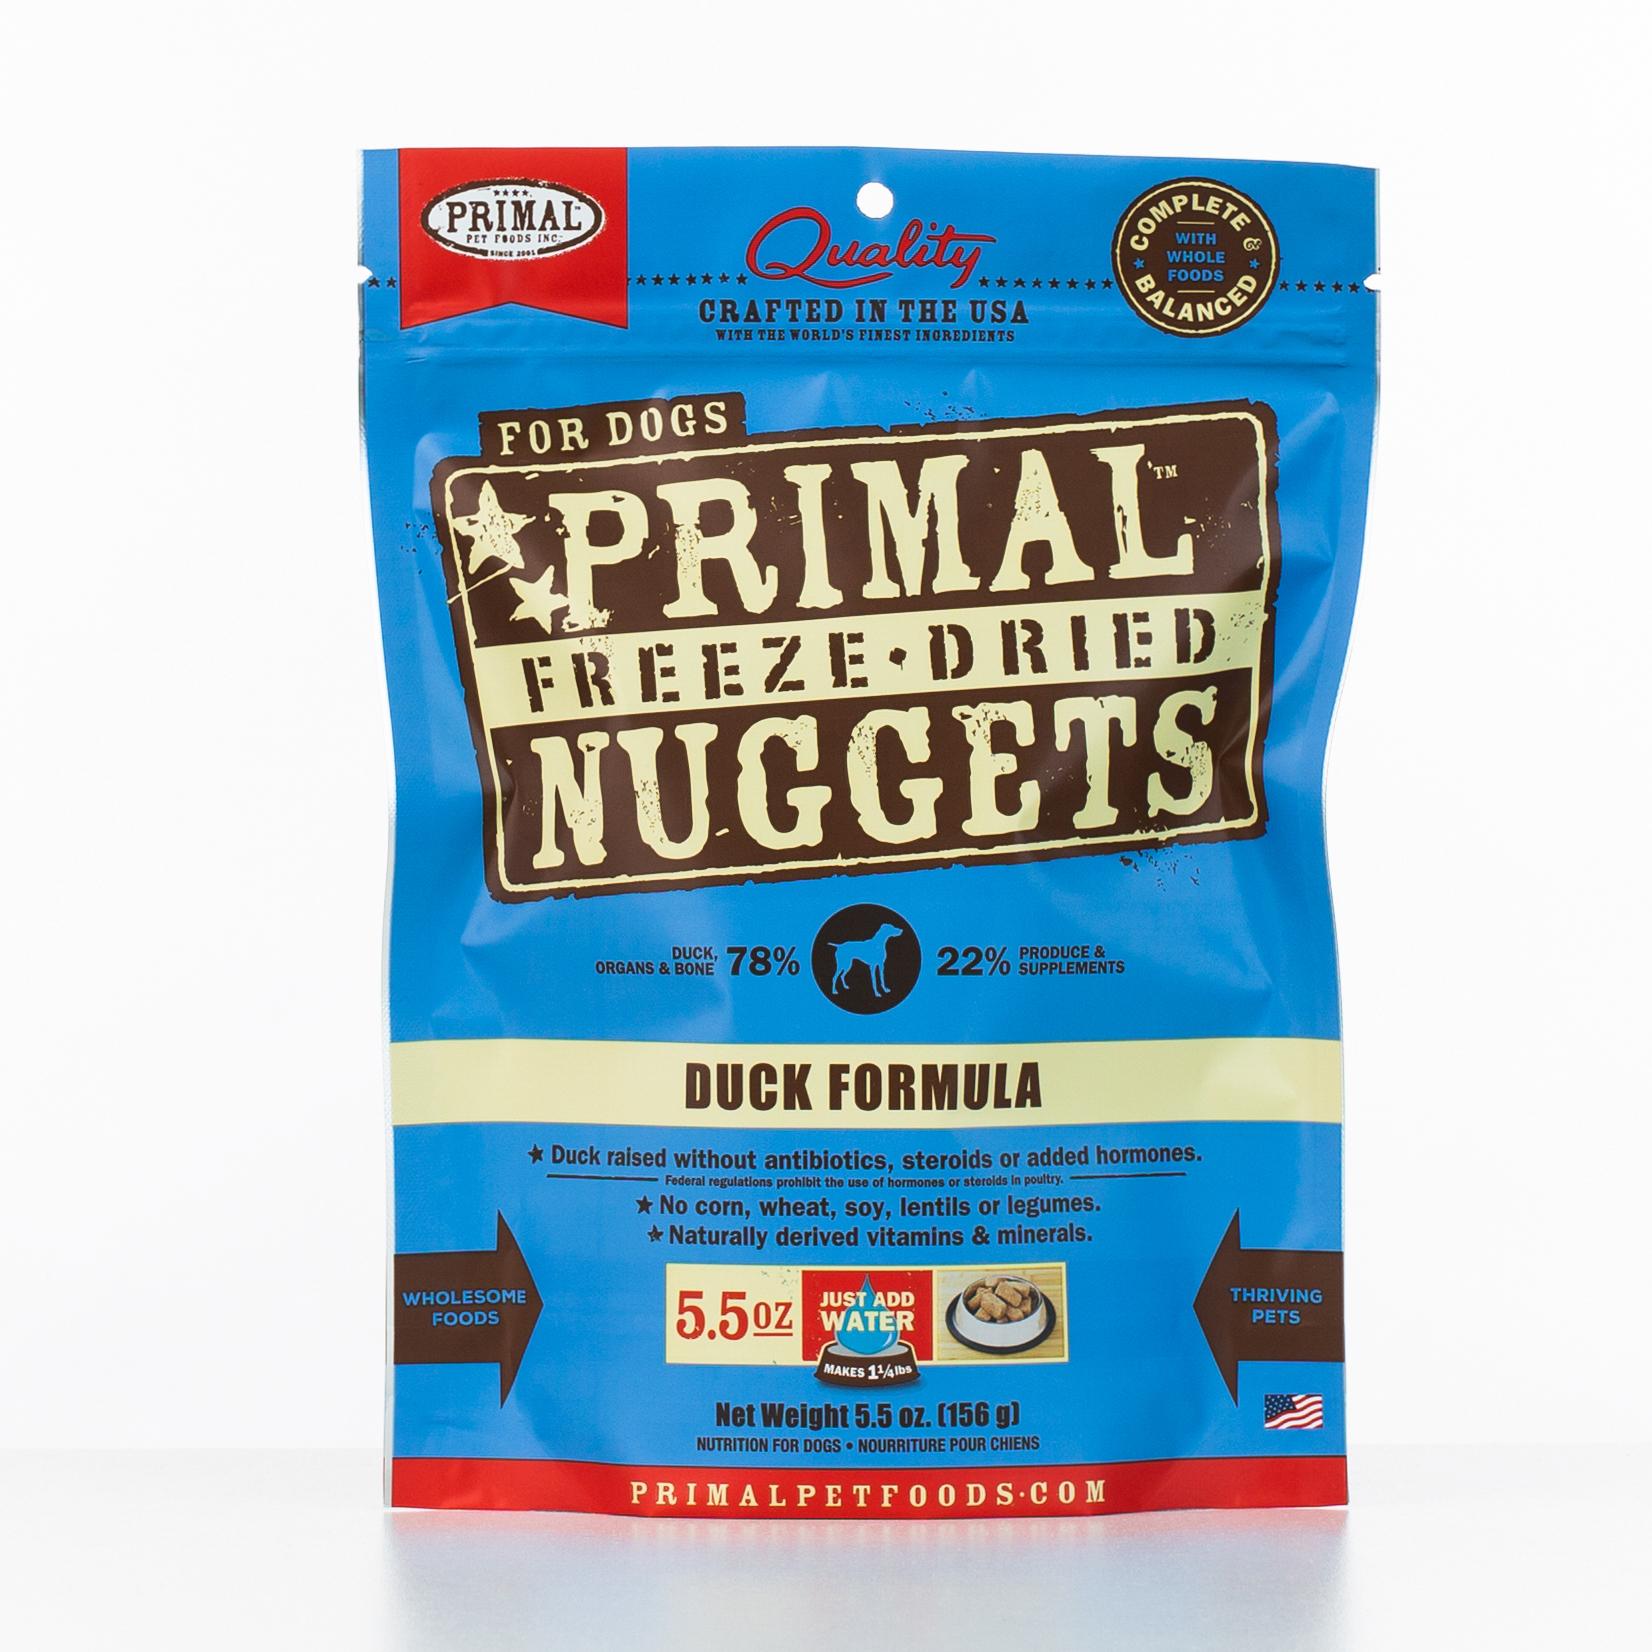 Primal Raw Freeze-Dried Nuggets Duck Formula Dog Food Image